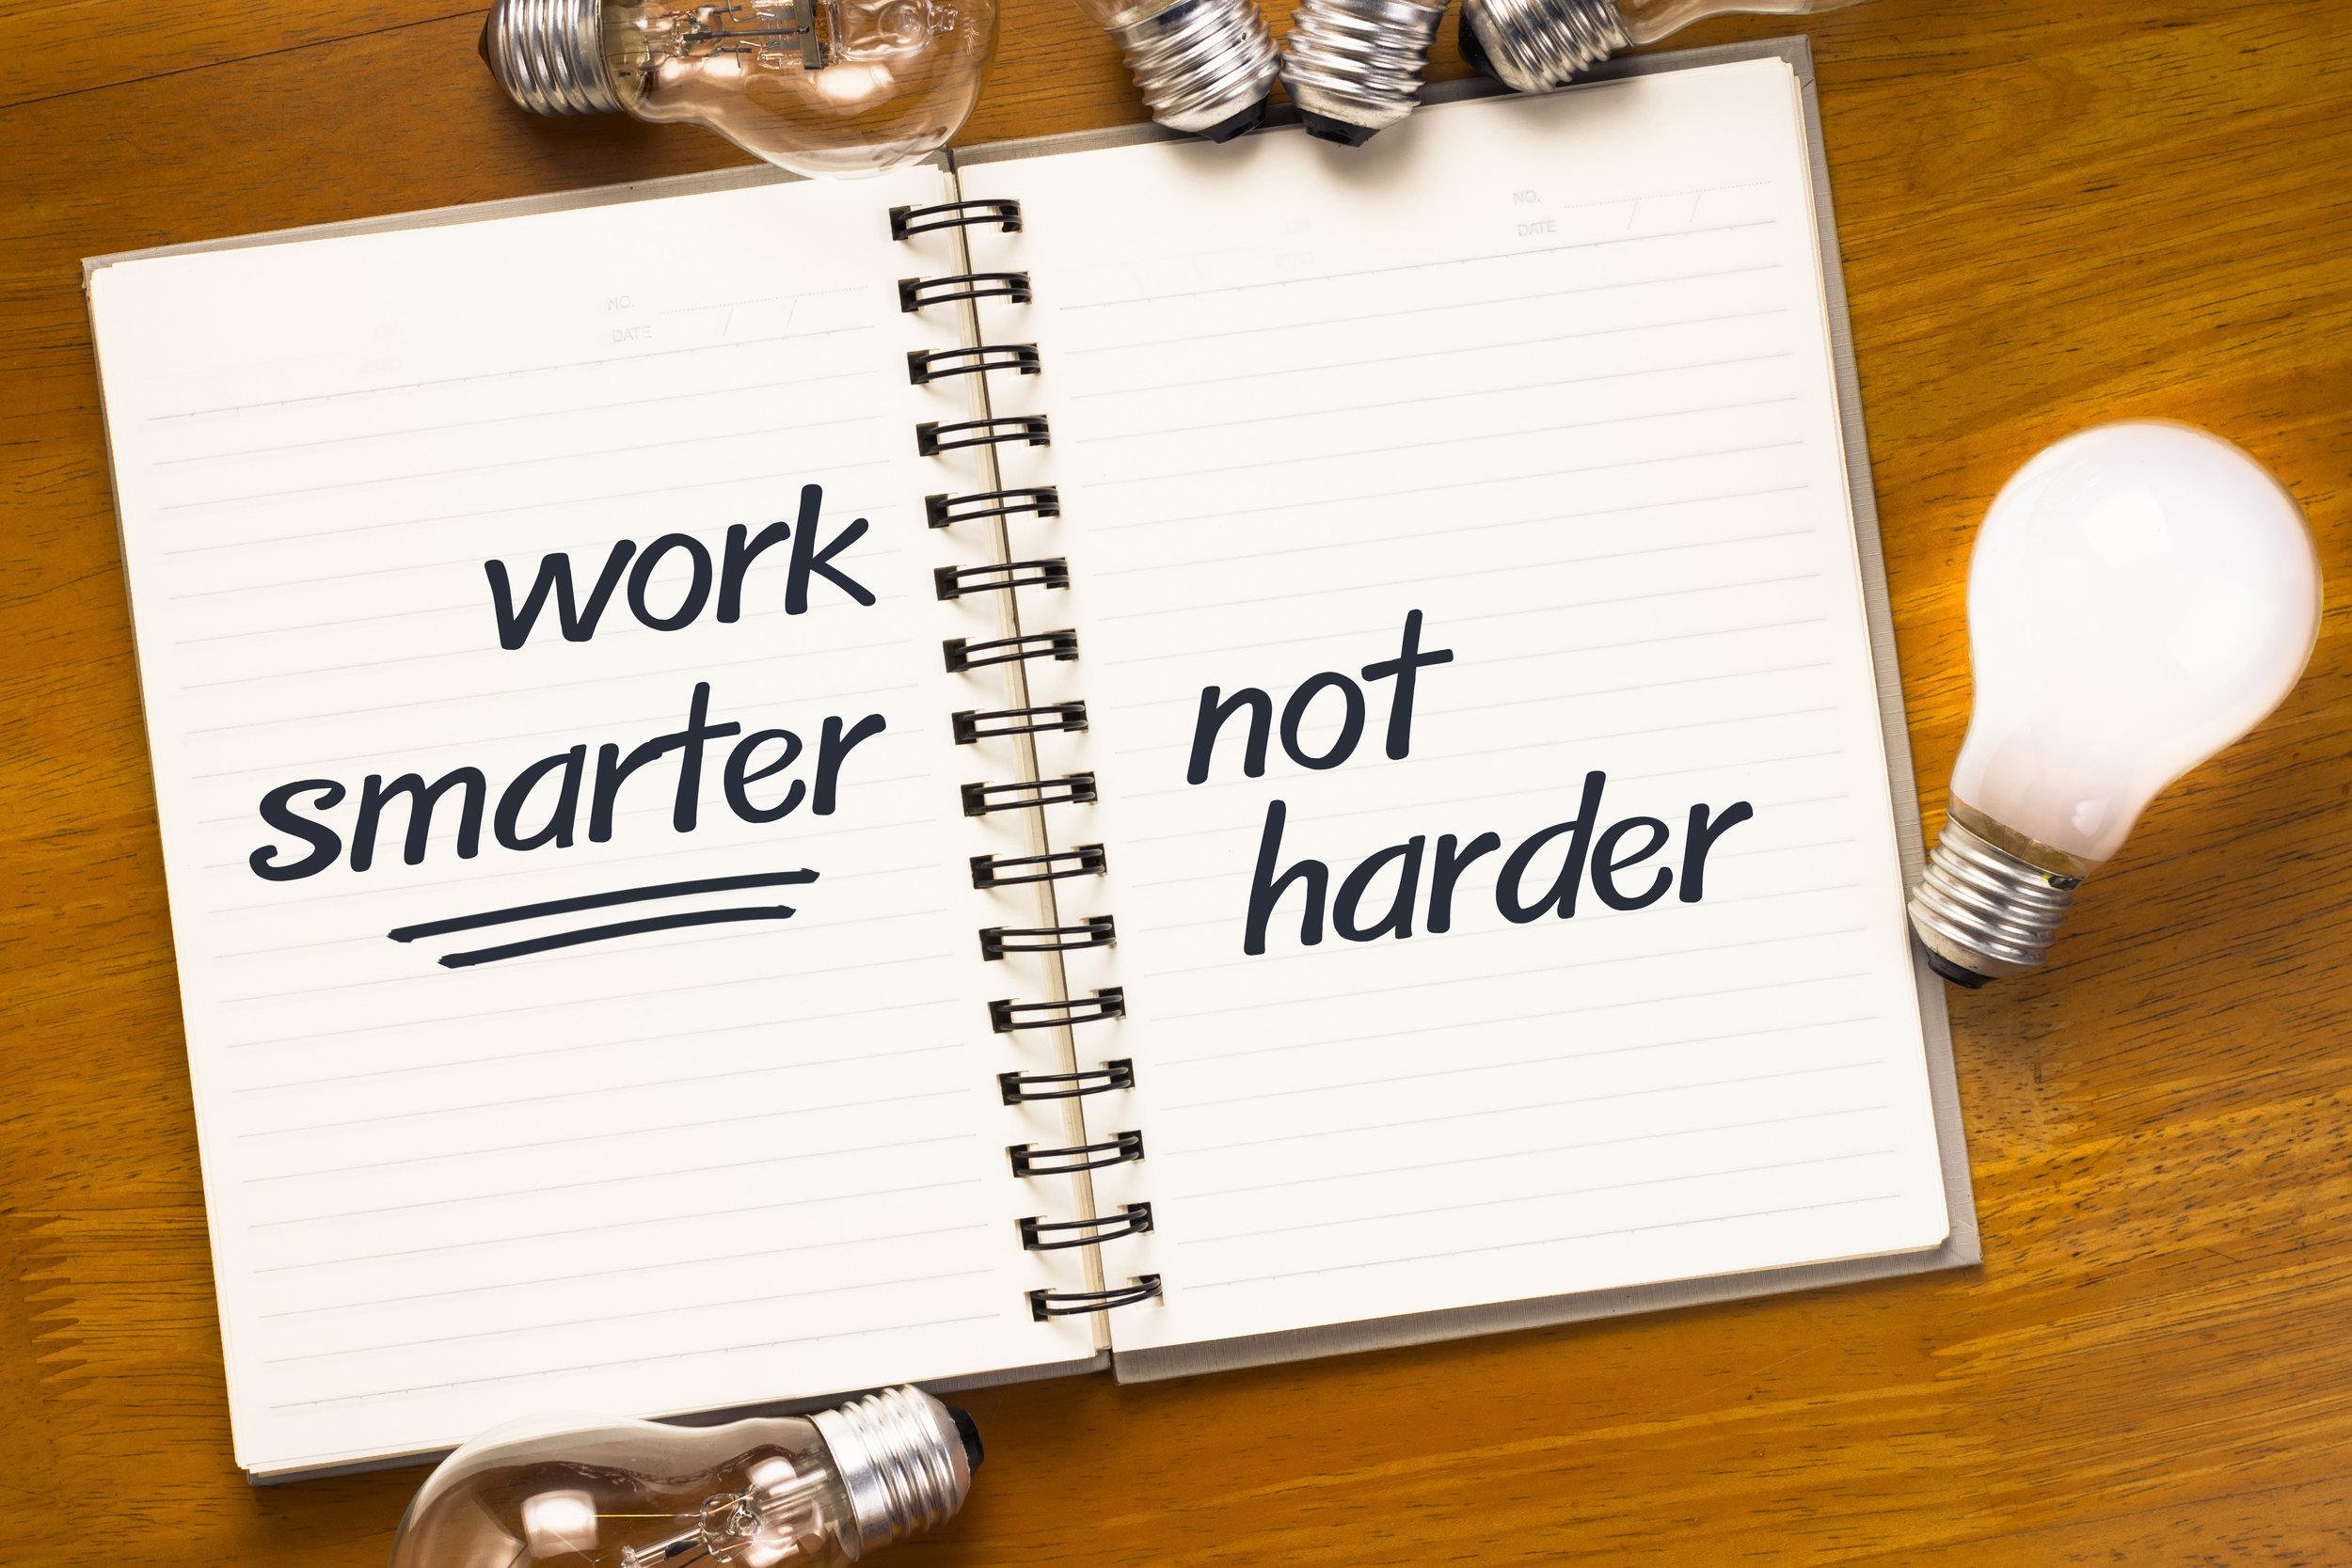 life coach nyc personal development work smarter